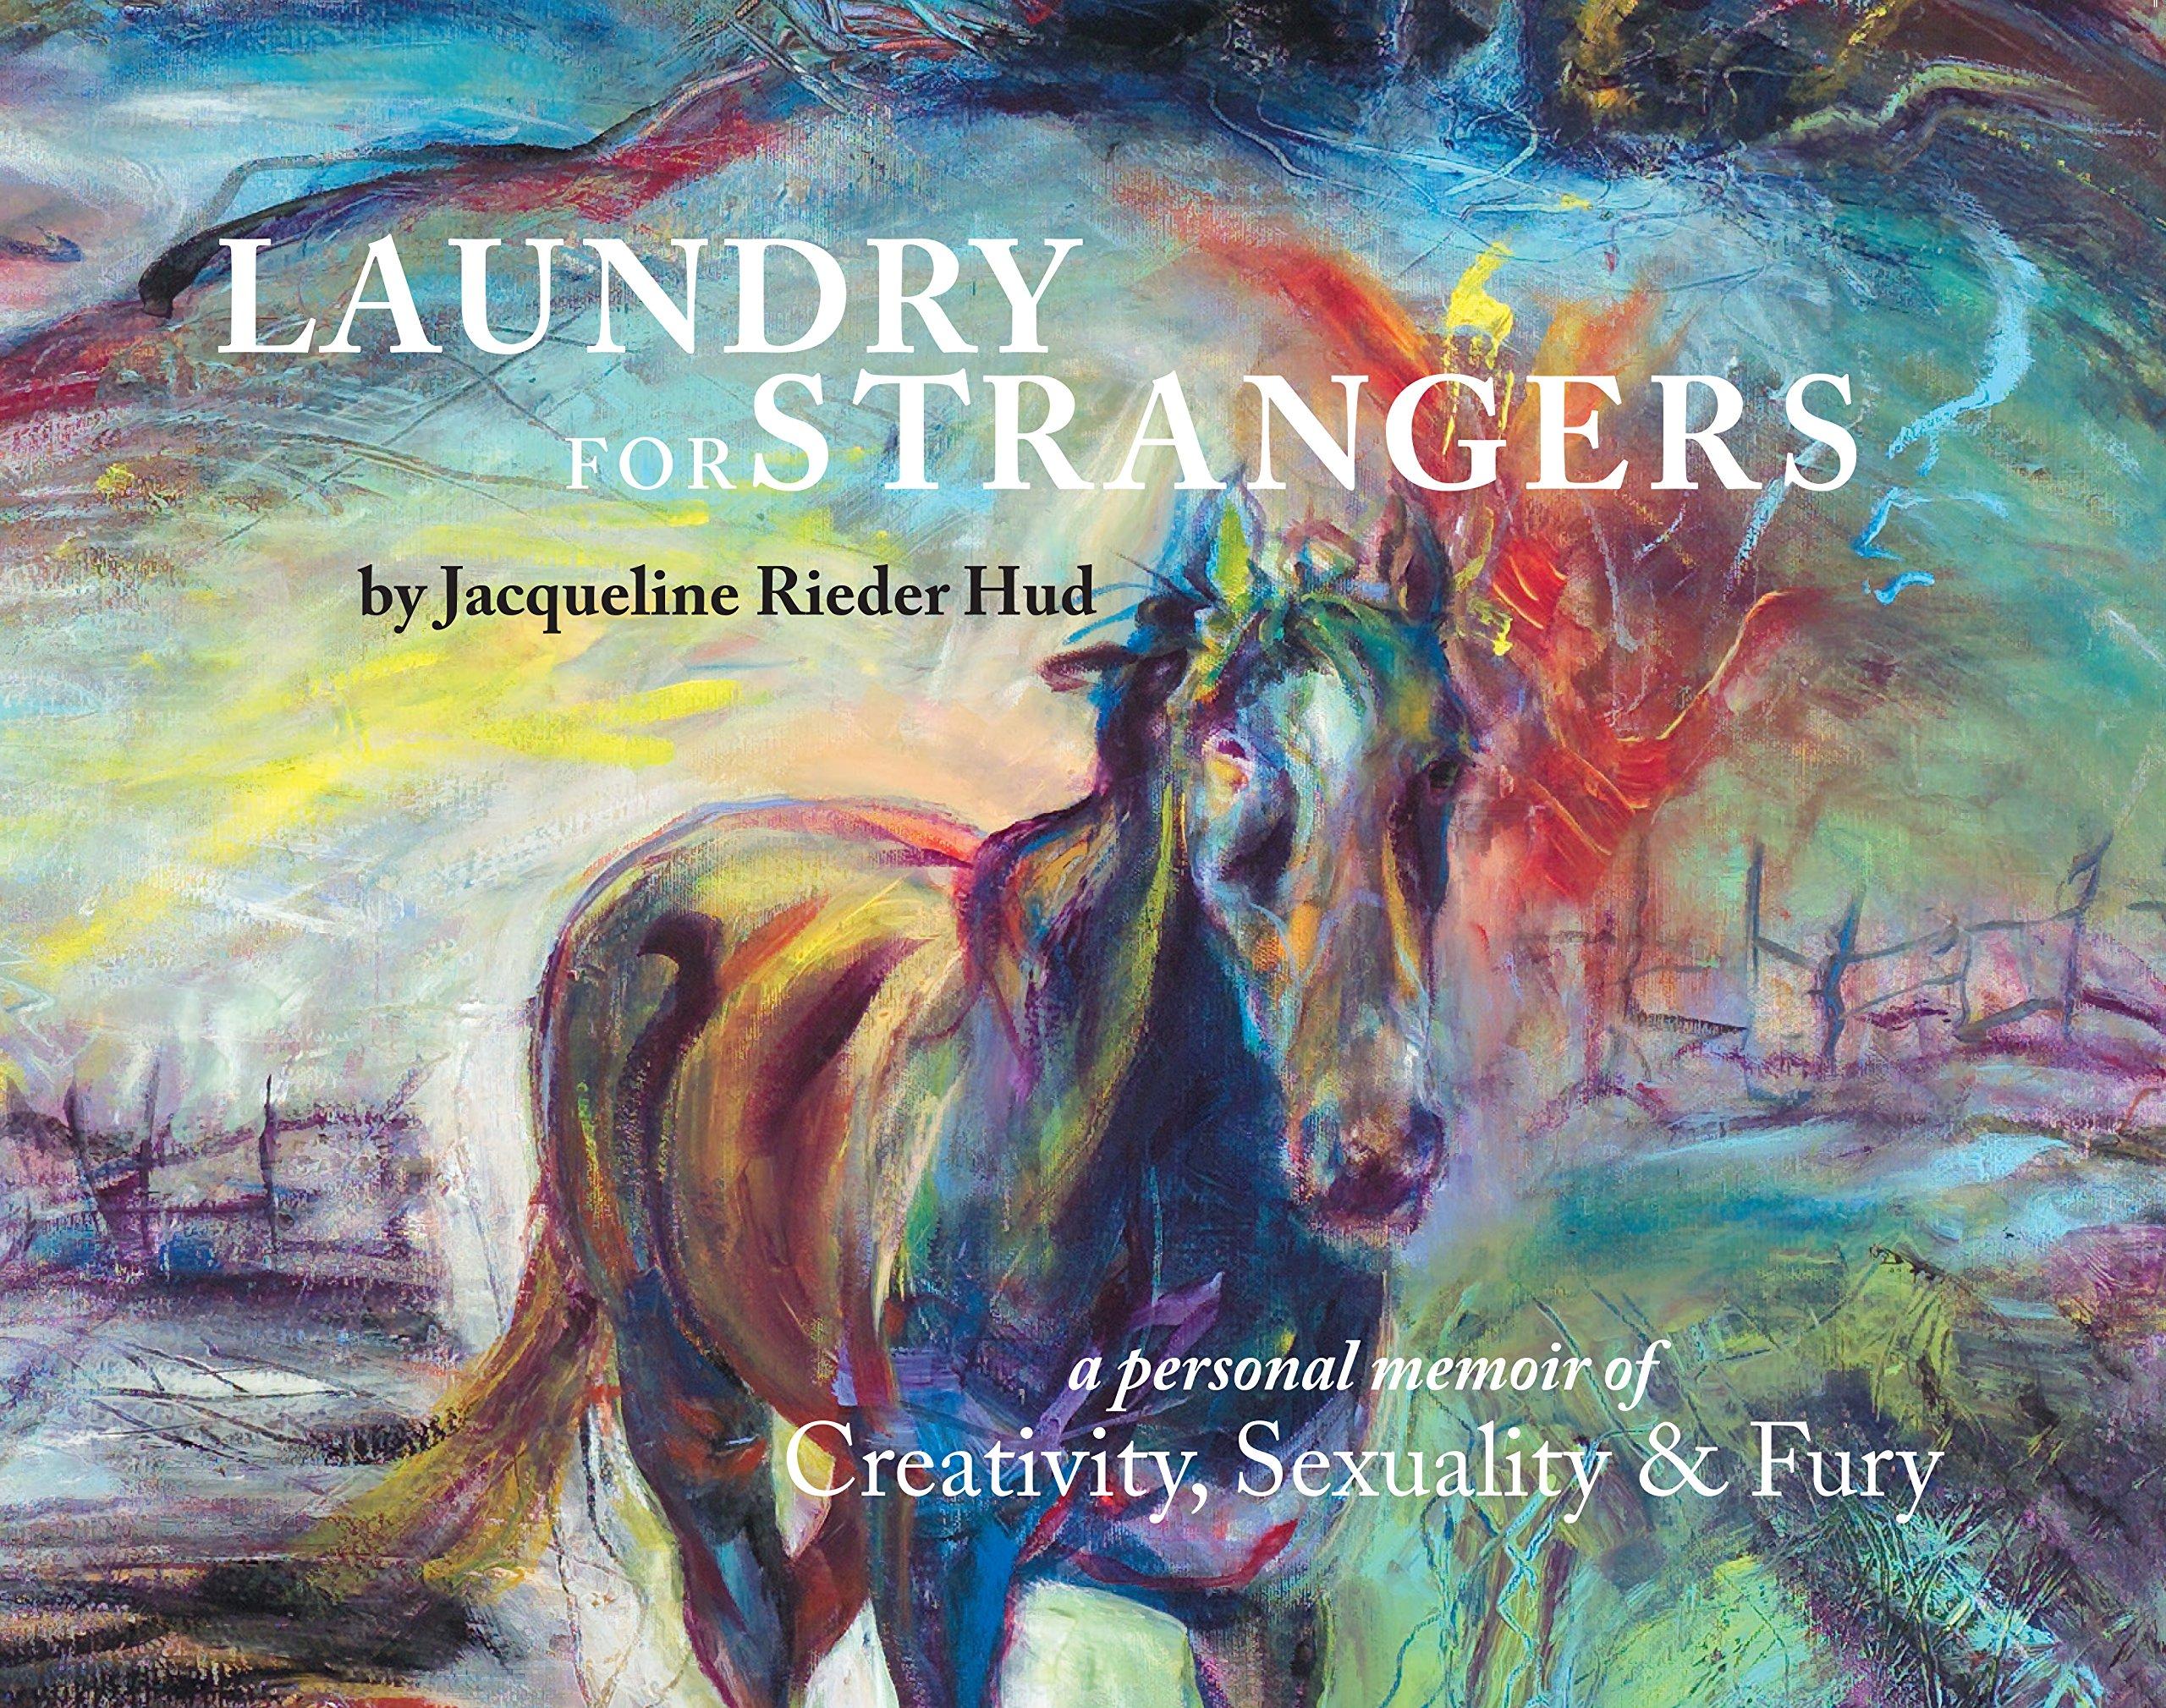 laundry-of-strangers